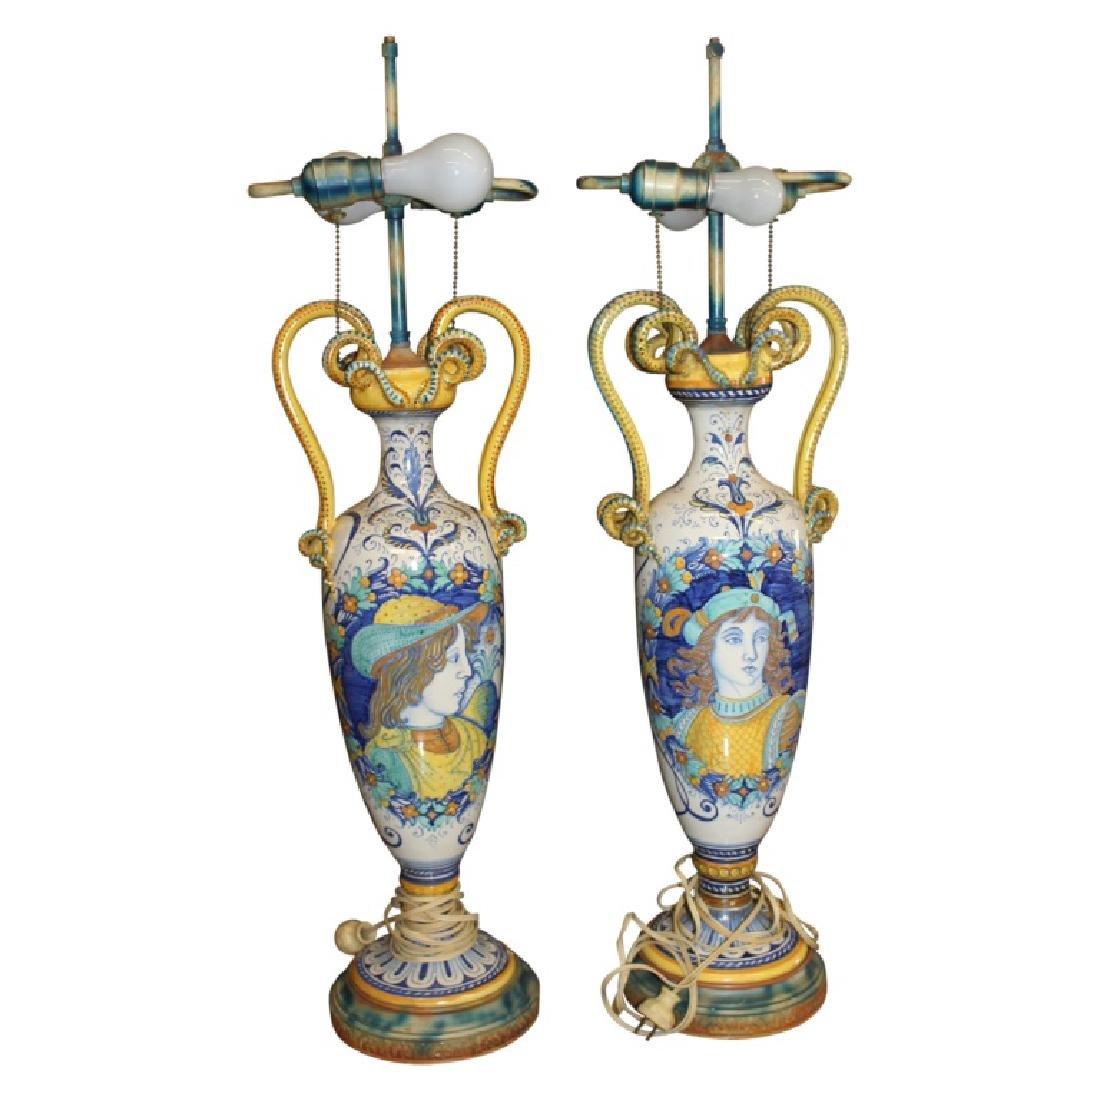 Pair of Porcelain Handled Lamps